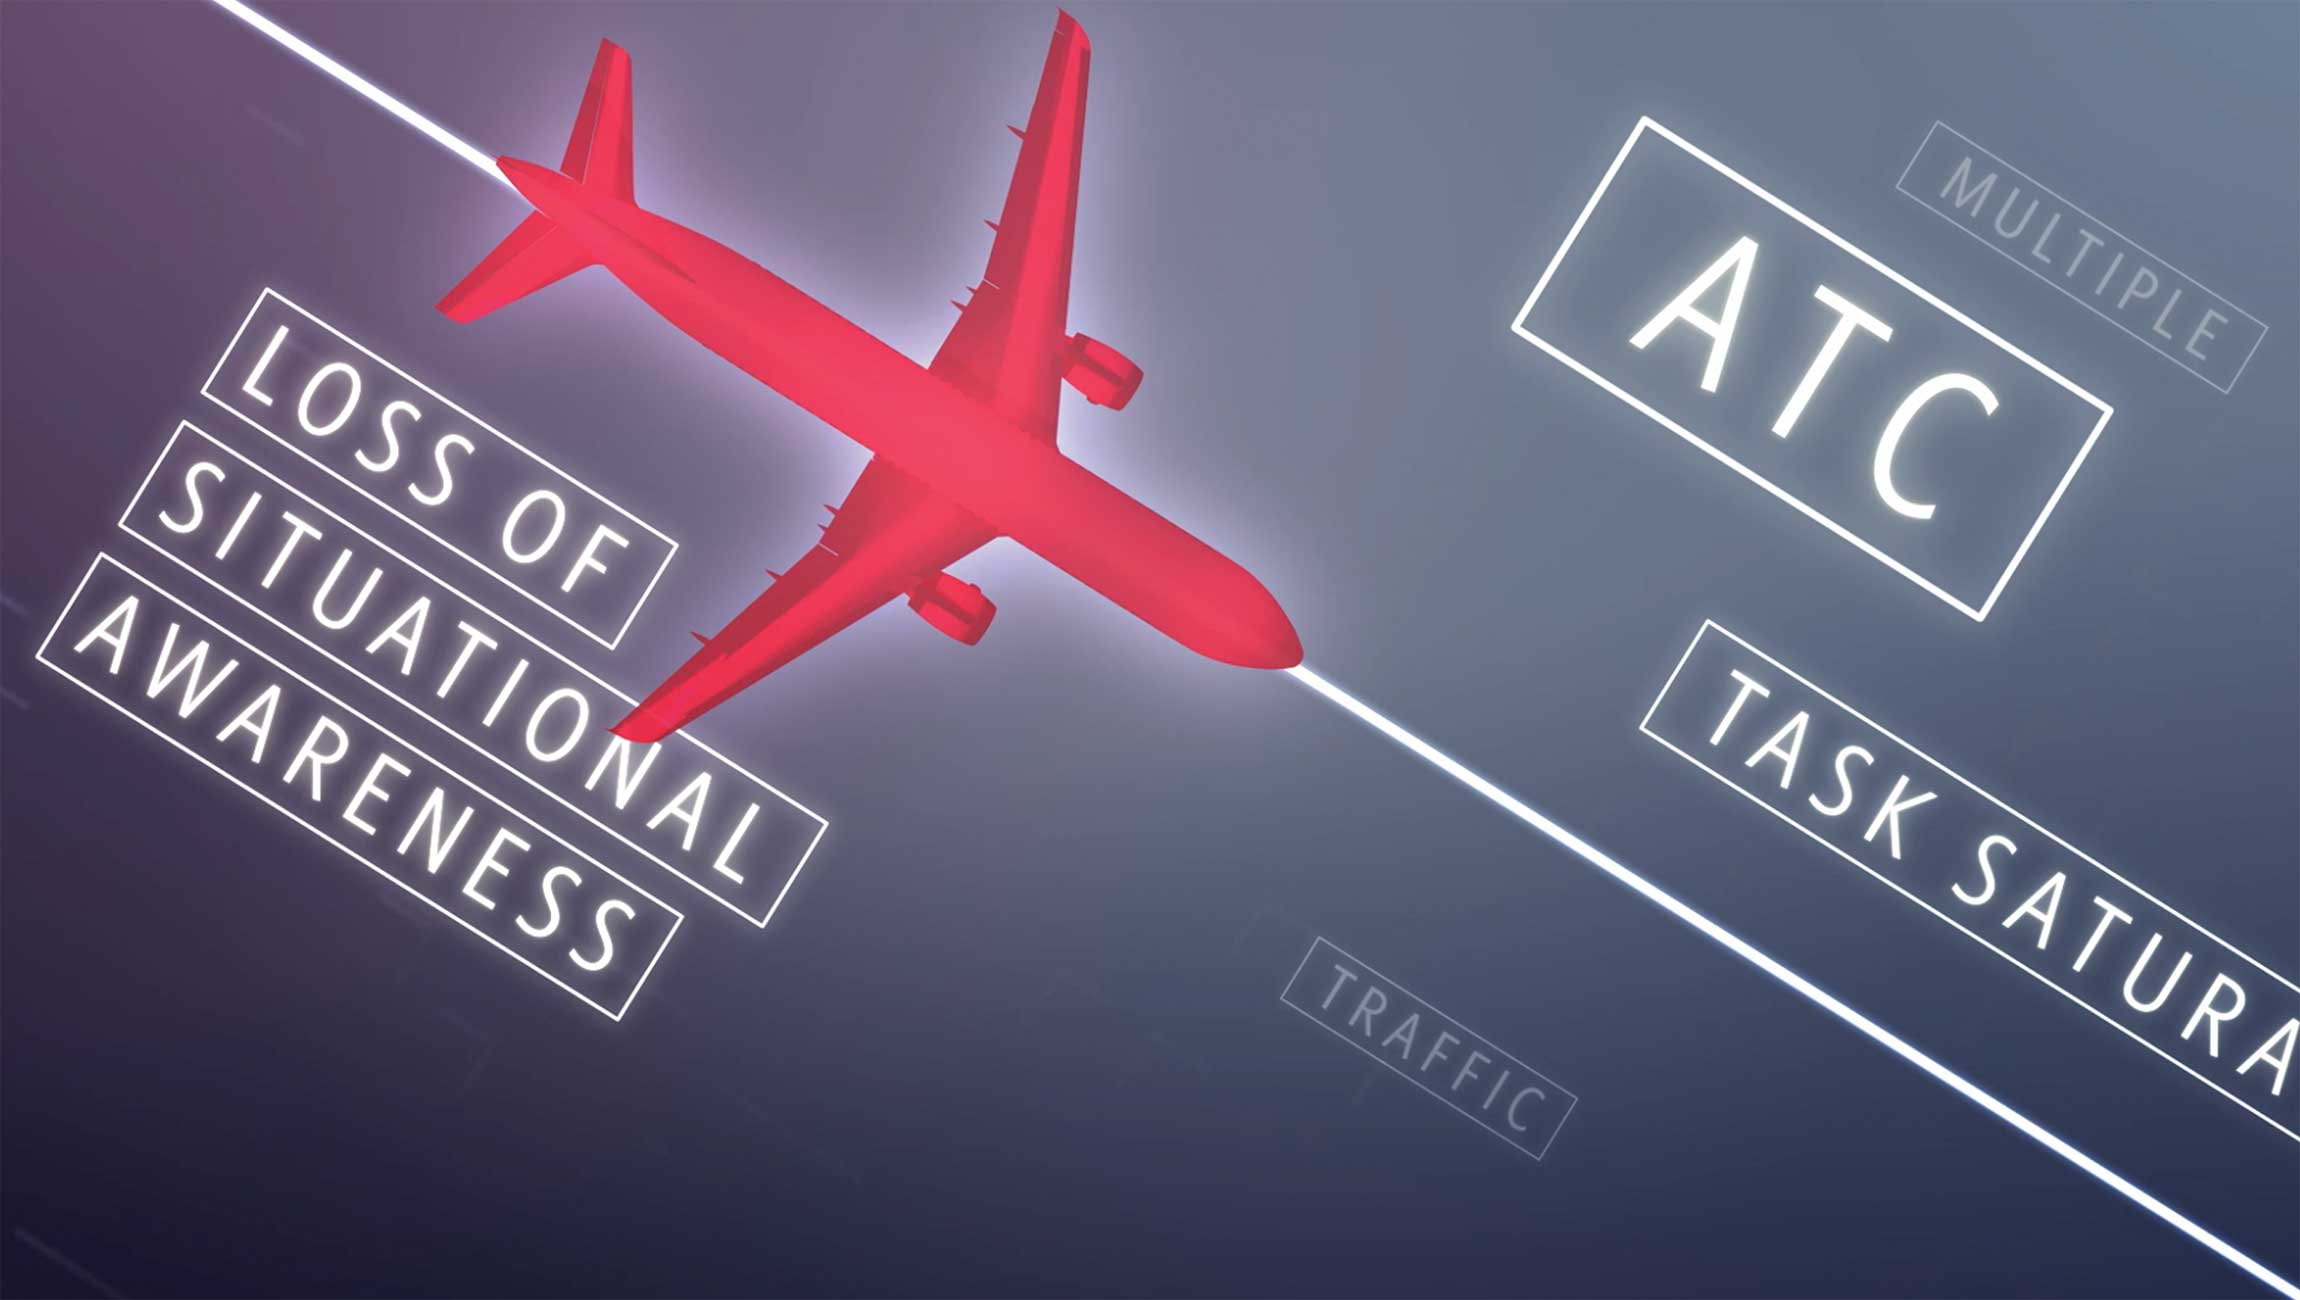 Delta Air Lines Flight Path Management Case Study